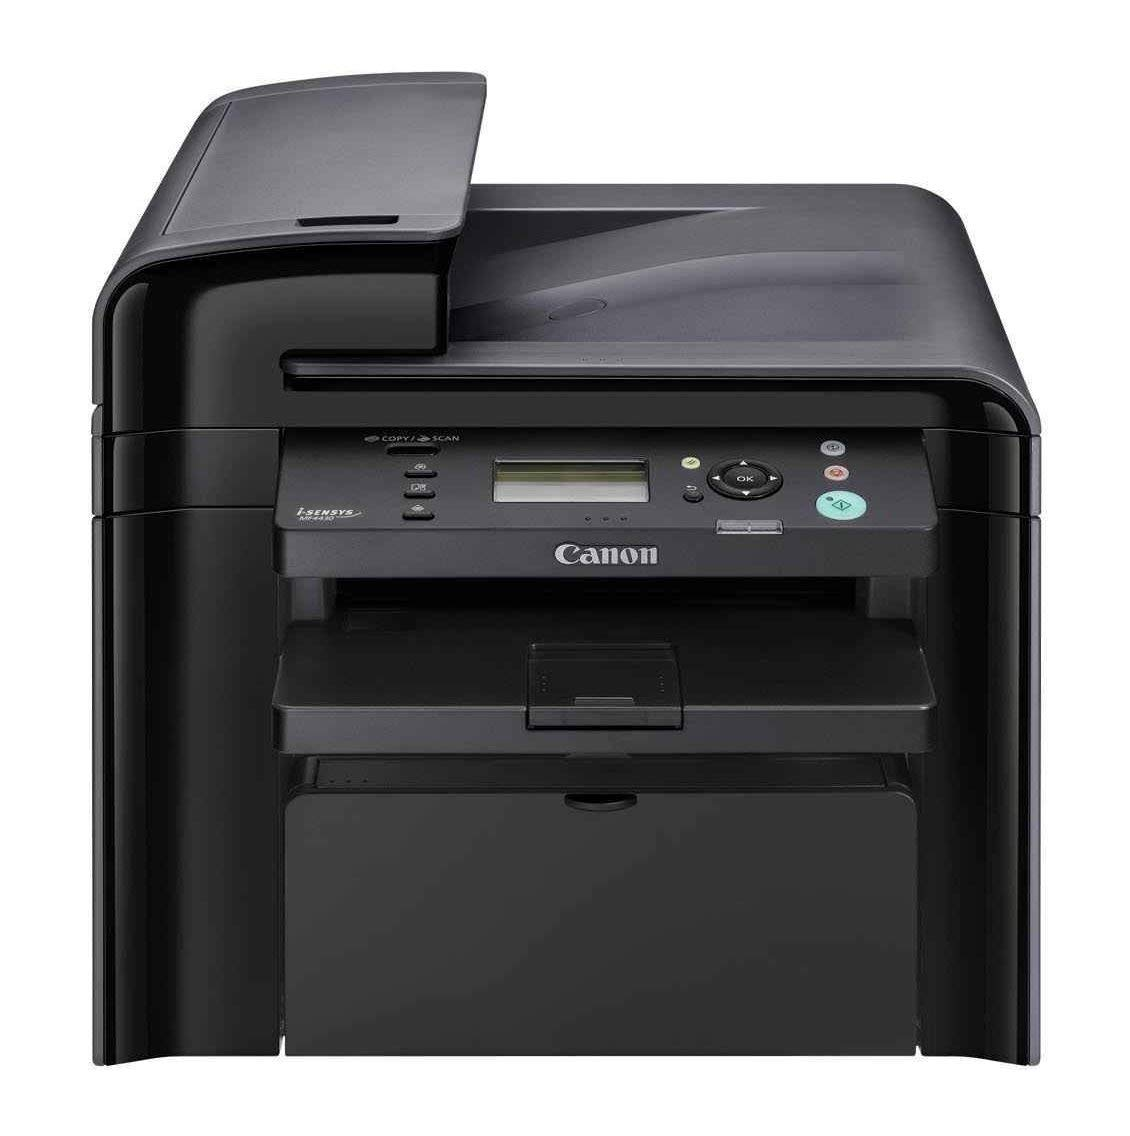 Canon i-SENSYS MF4410 Driver Downloads | Download Drivers Printer Free